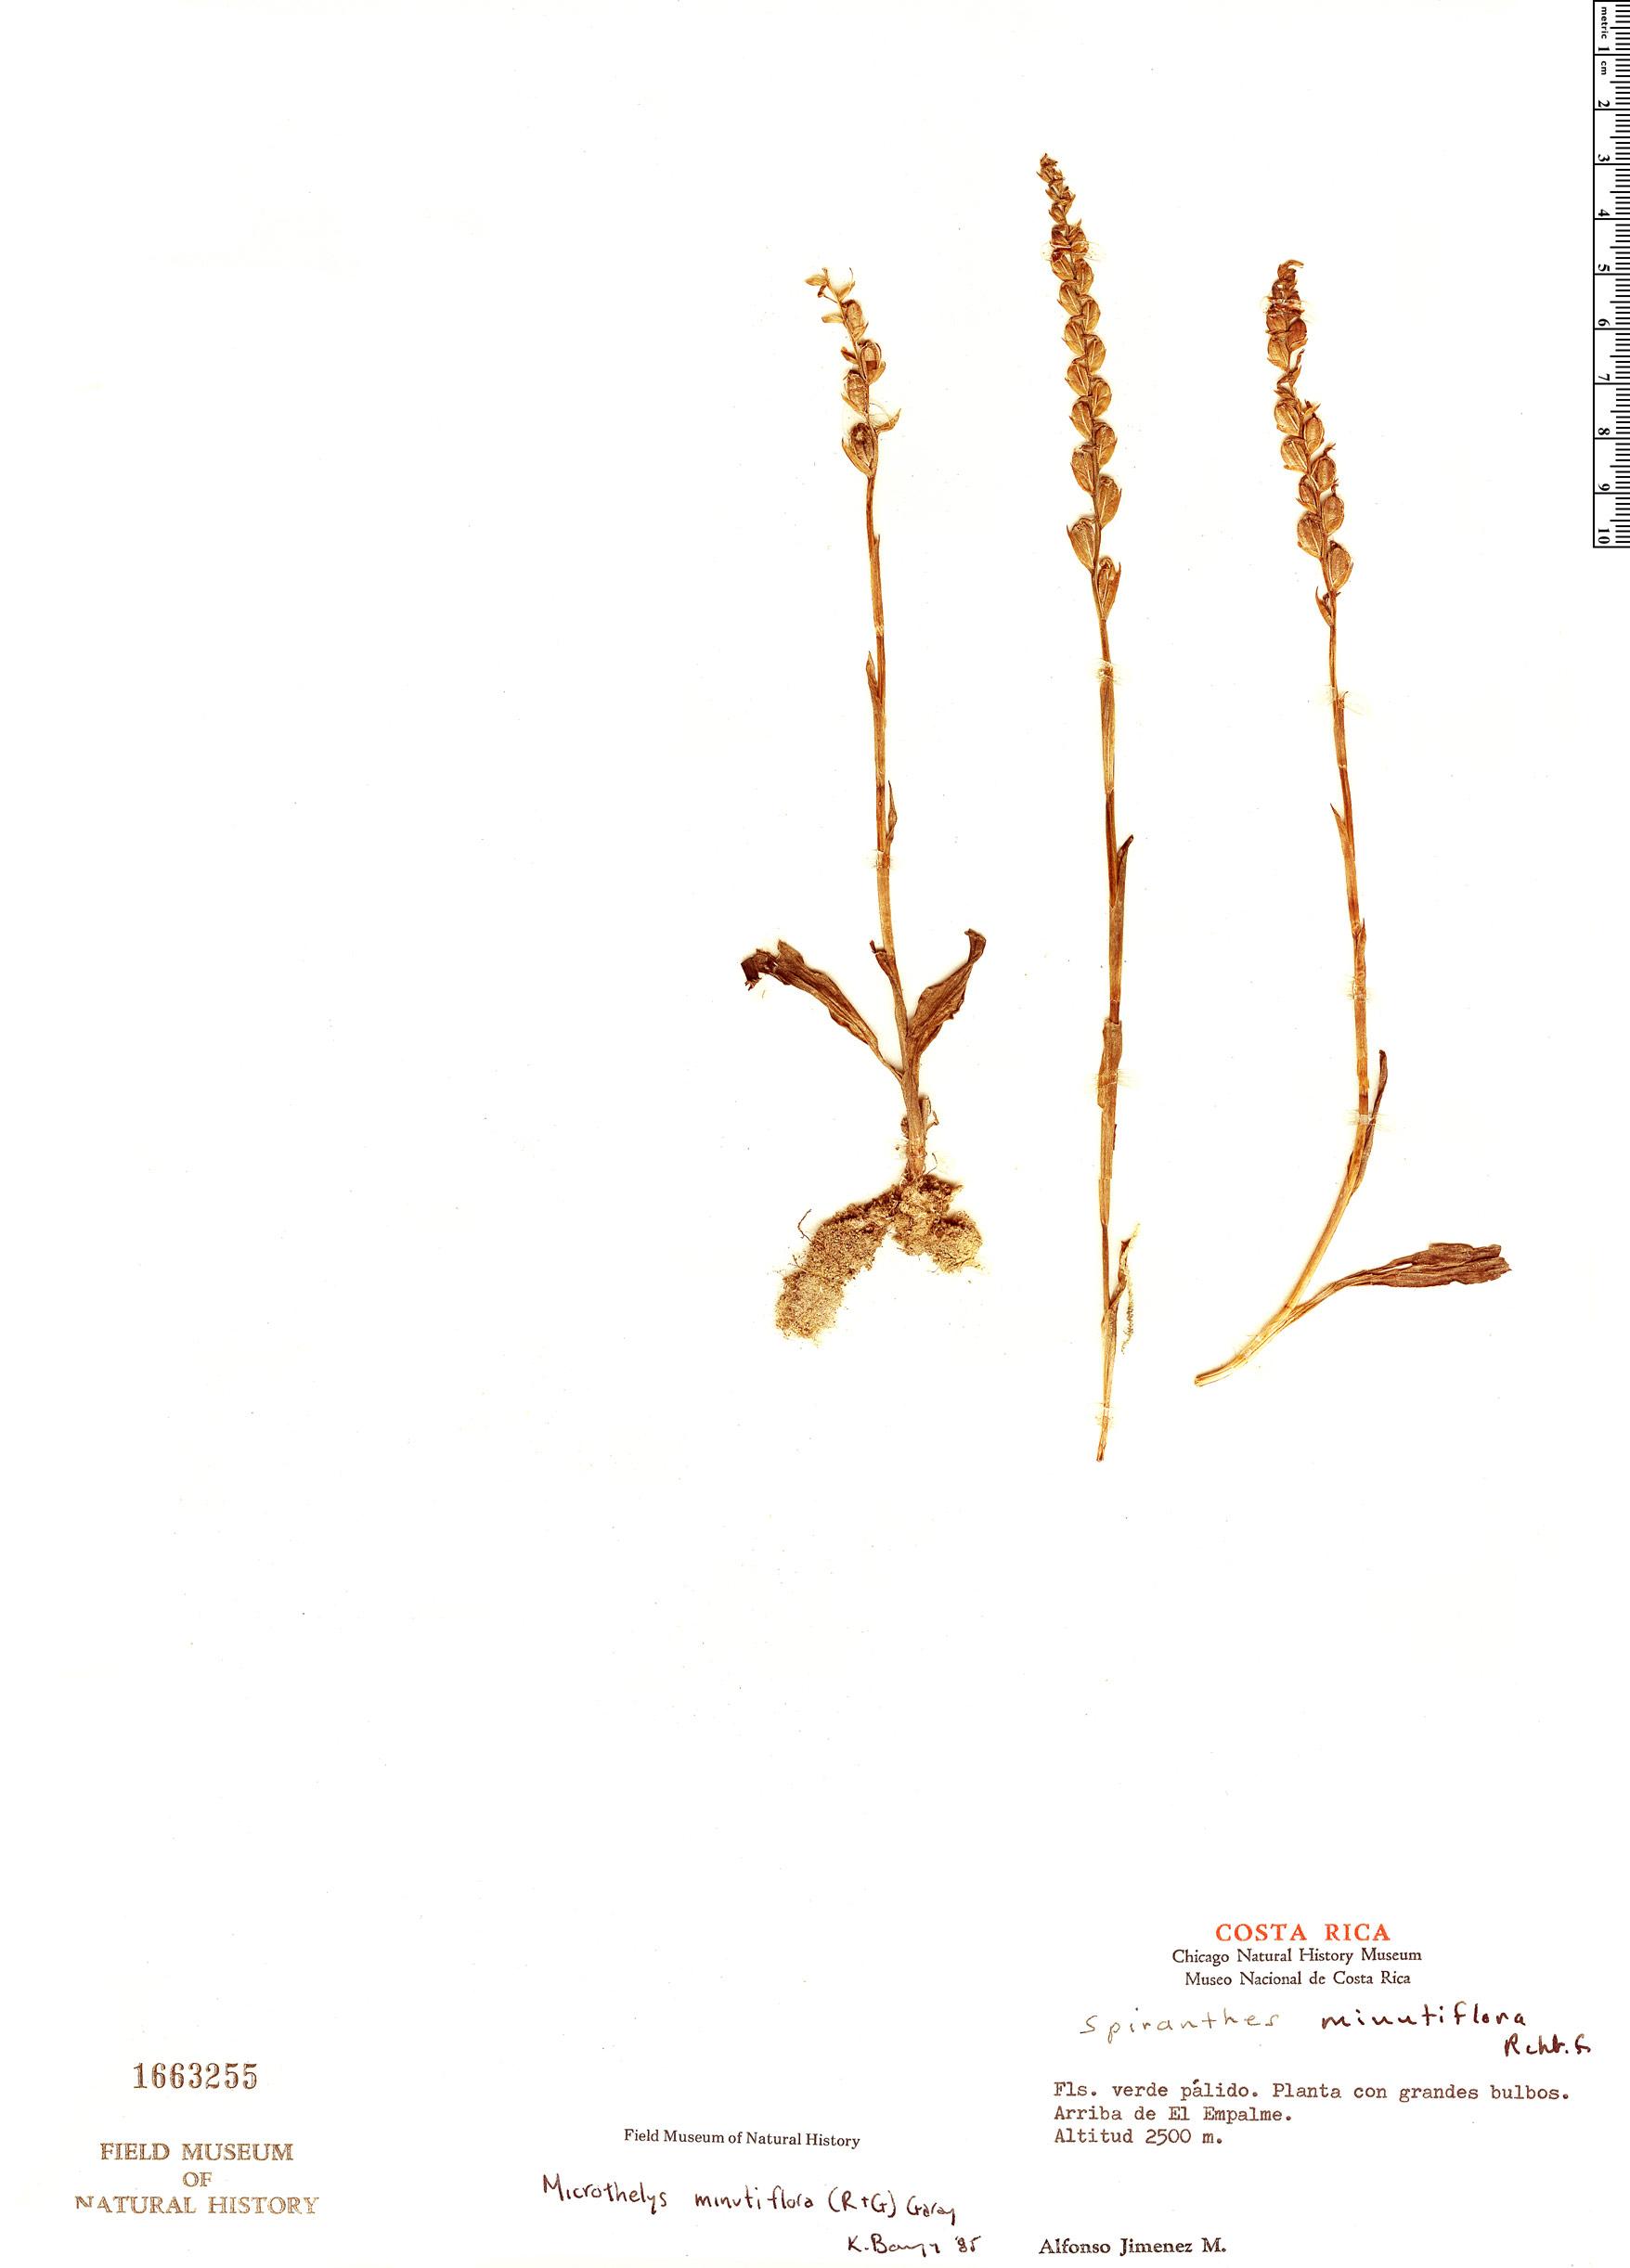 Espécime: Galeottiella minutiflora